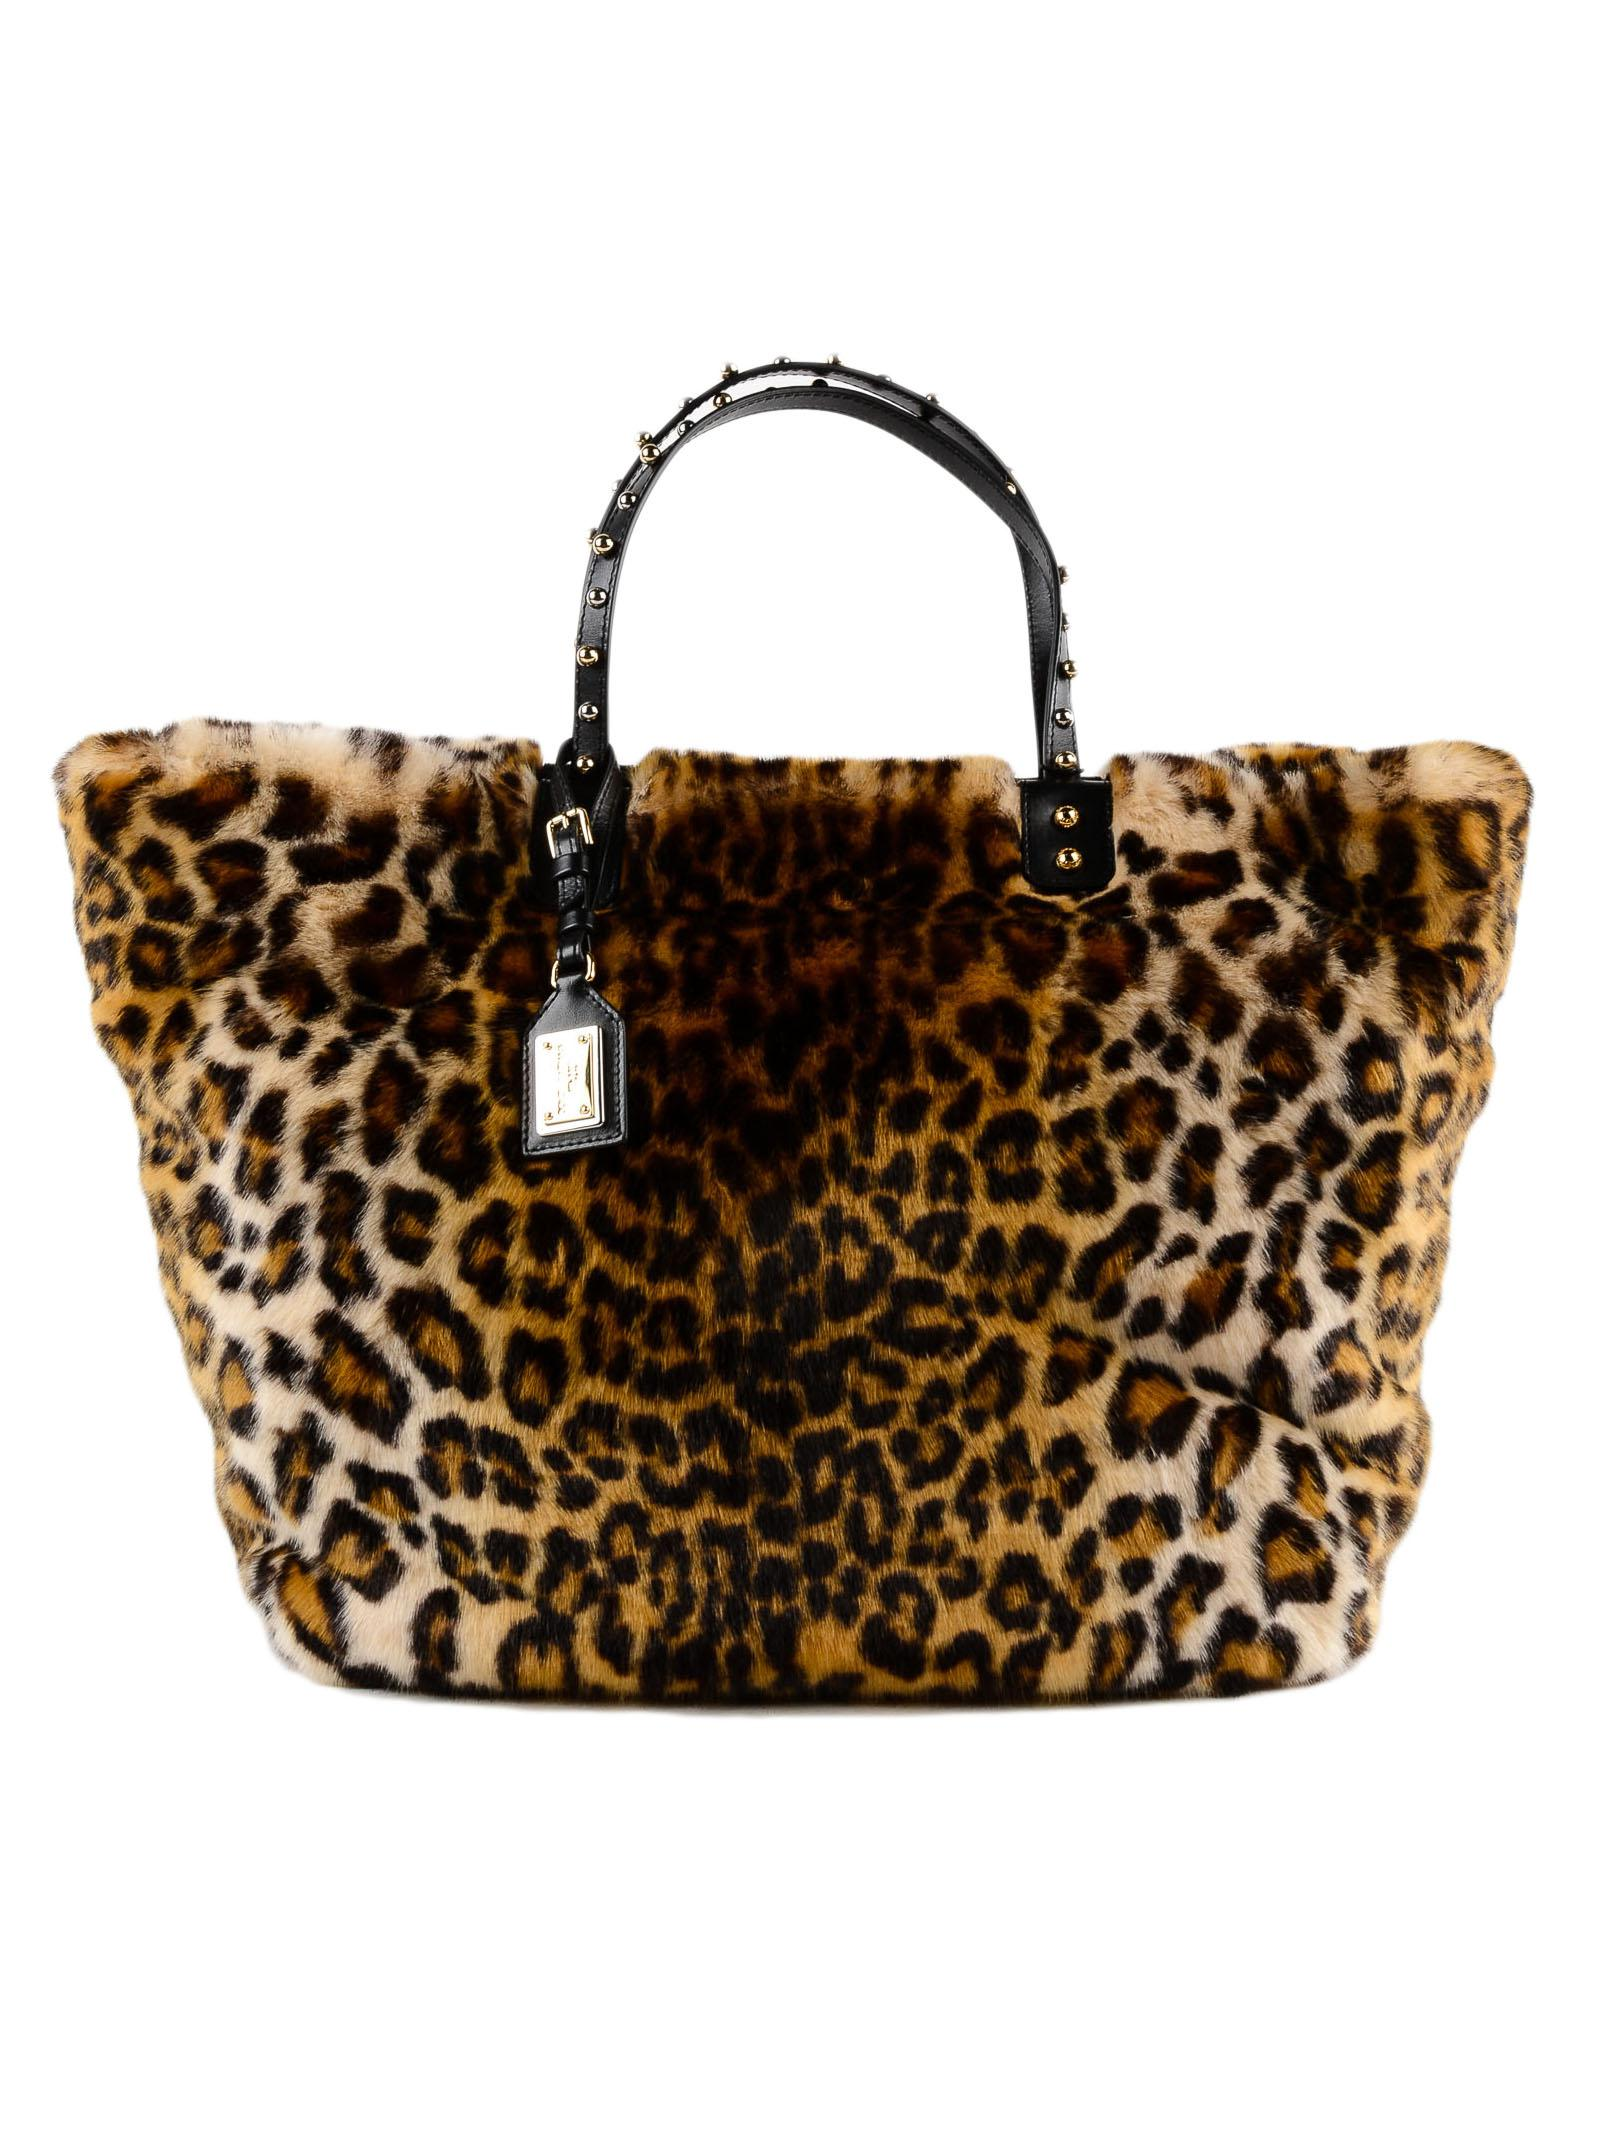 cb5314f44d64 Lyst - Dolce   Gabbana Eco Fur Leo Shopping Bag